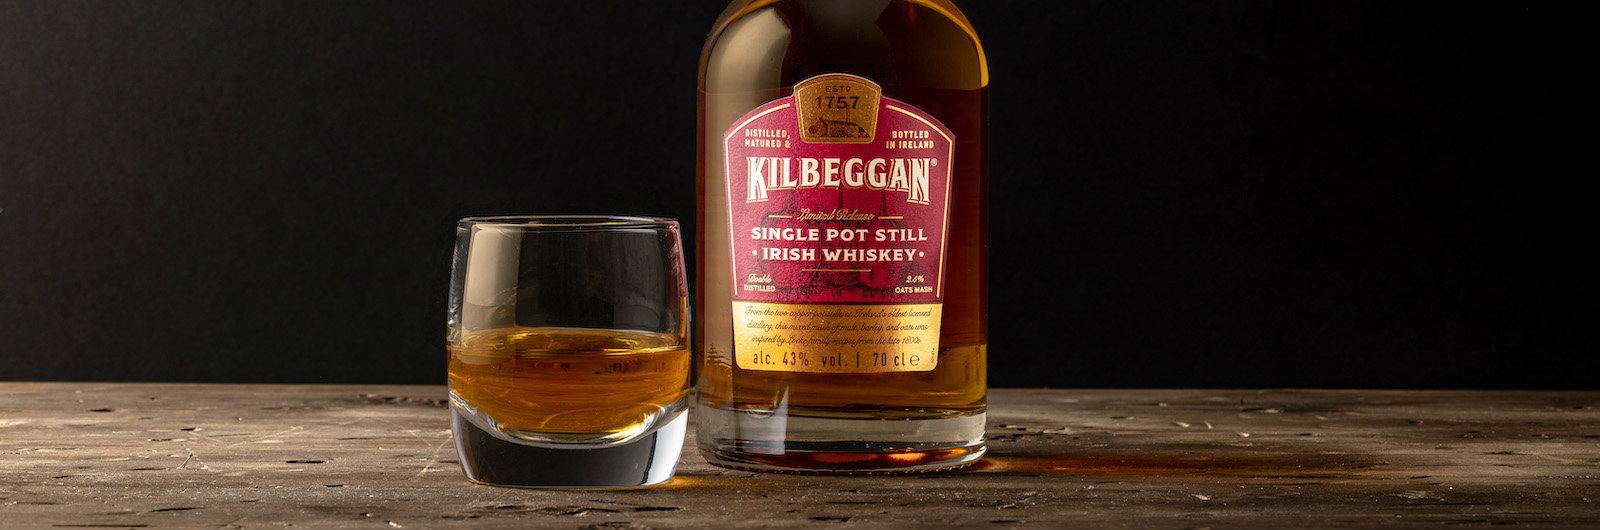 3 New Irish Whiskeys to Drink on St. Patrick's Day